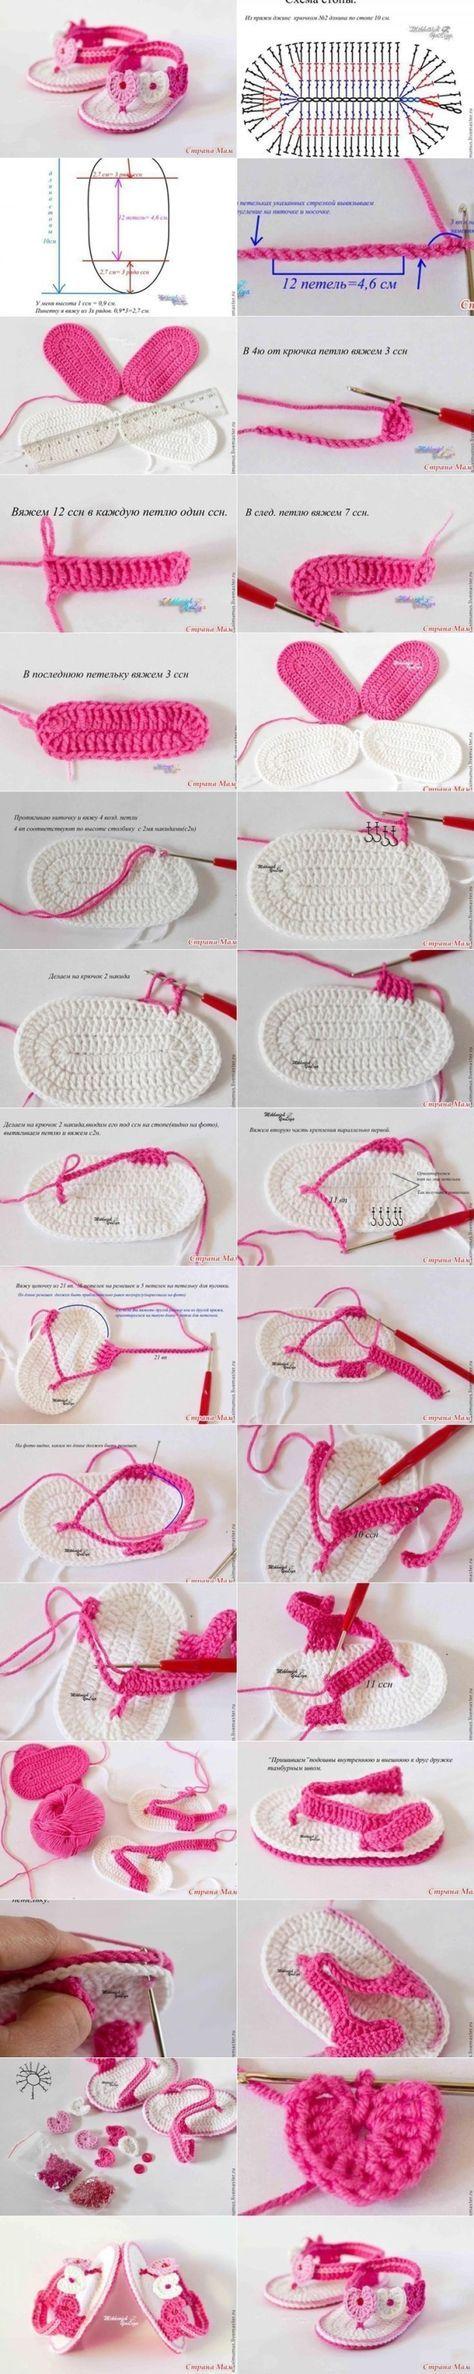 Repeat After me Crochet: DIY Sweet Crochet Baby Summer Bootie by Nina Maltese